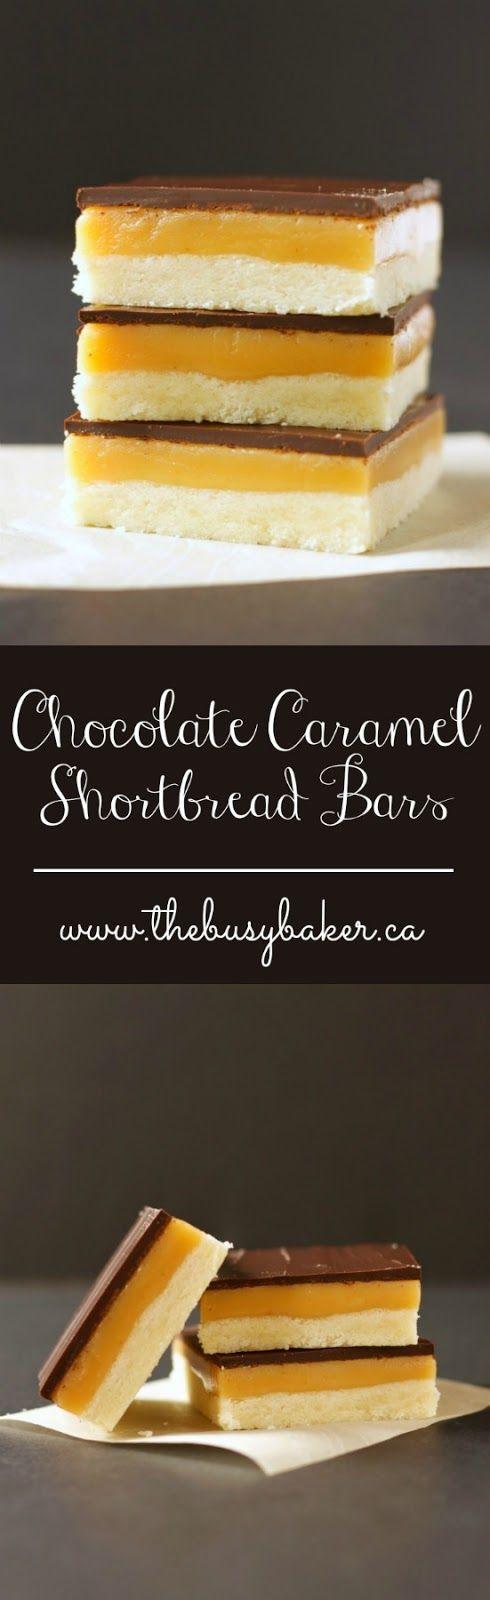 The Busy Baker: Chocolate Caramel Shortbread Bars